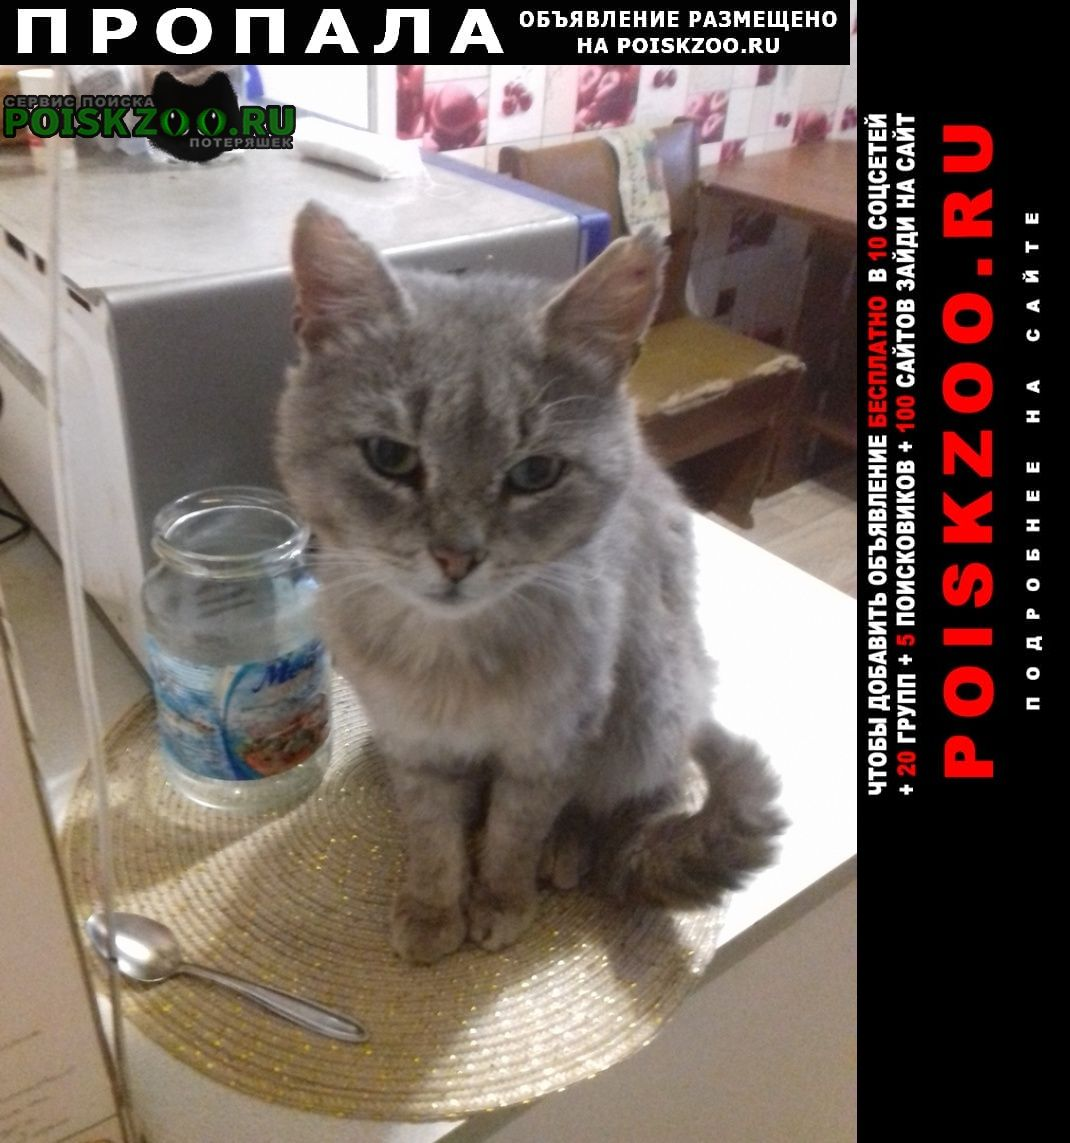 Пропала кошка Подпорожье